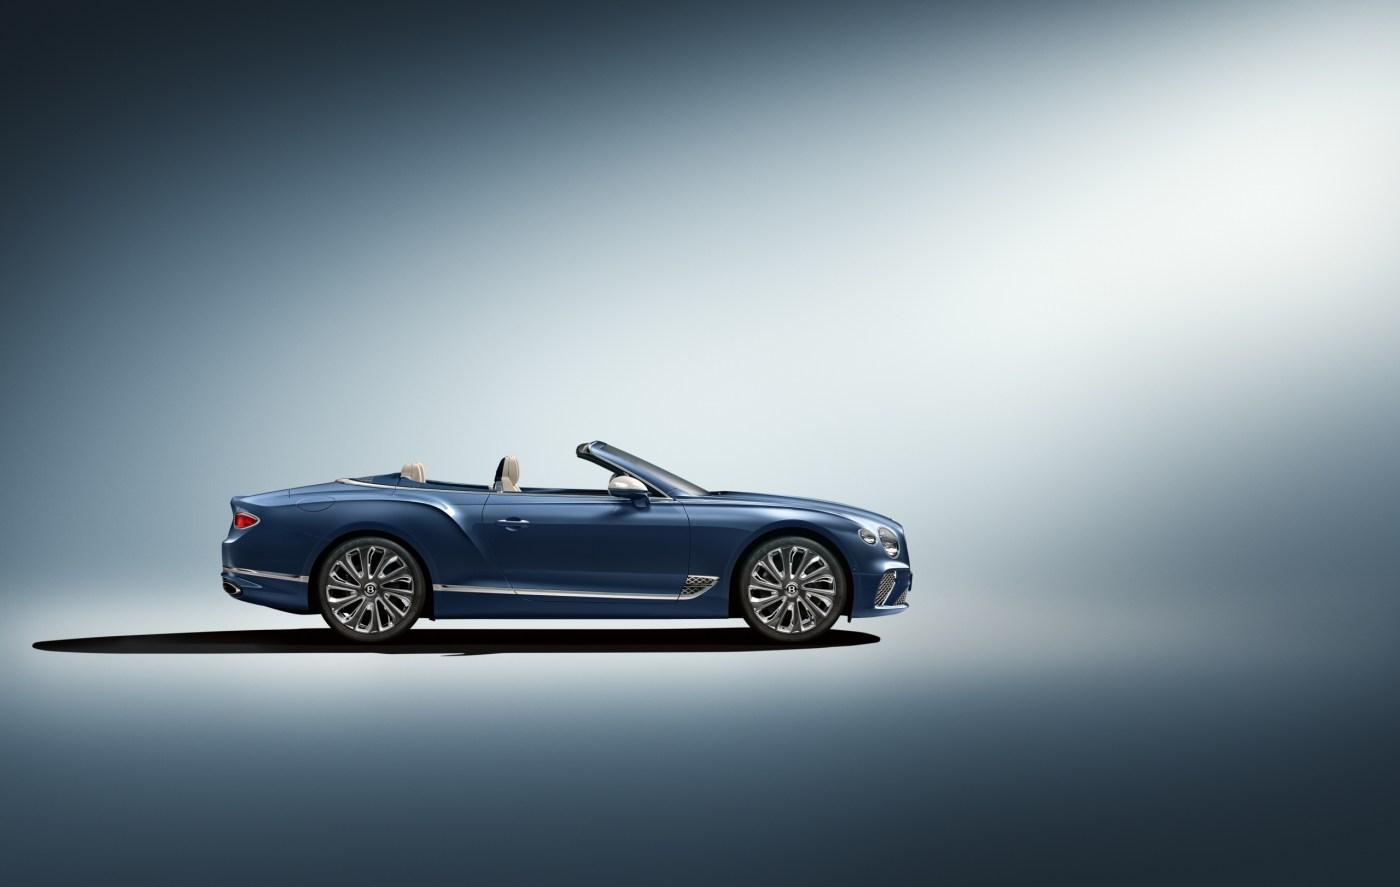 2020 Bentley Continental GT Mulliner Convertible